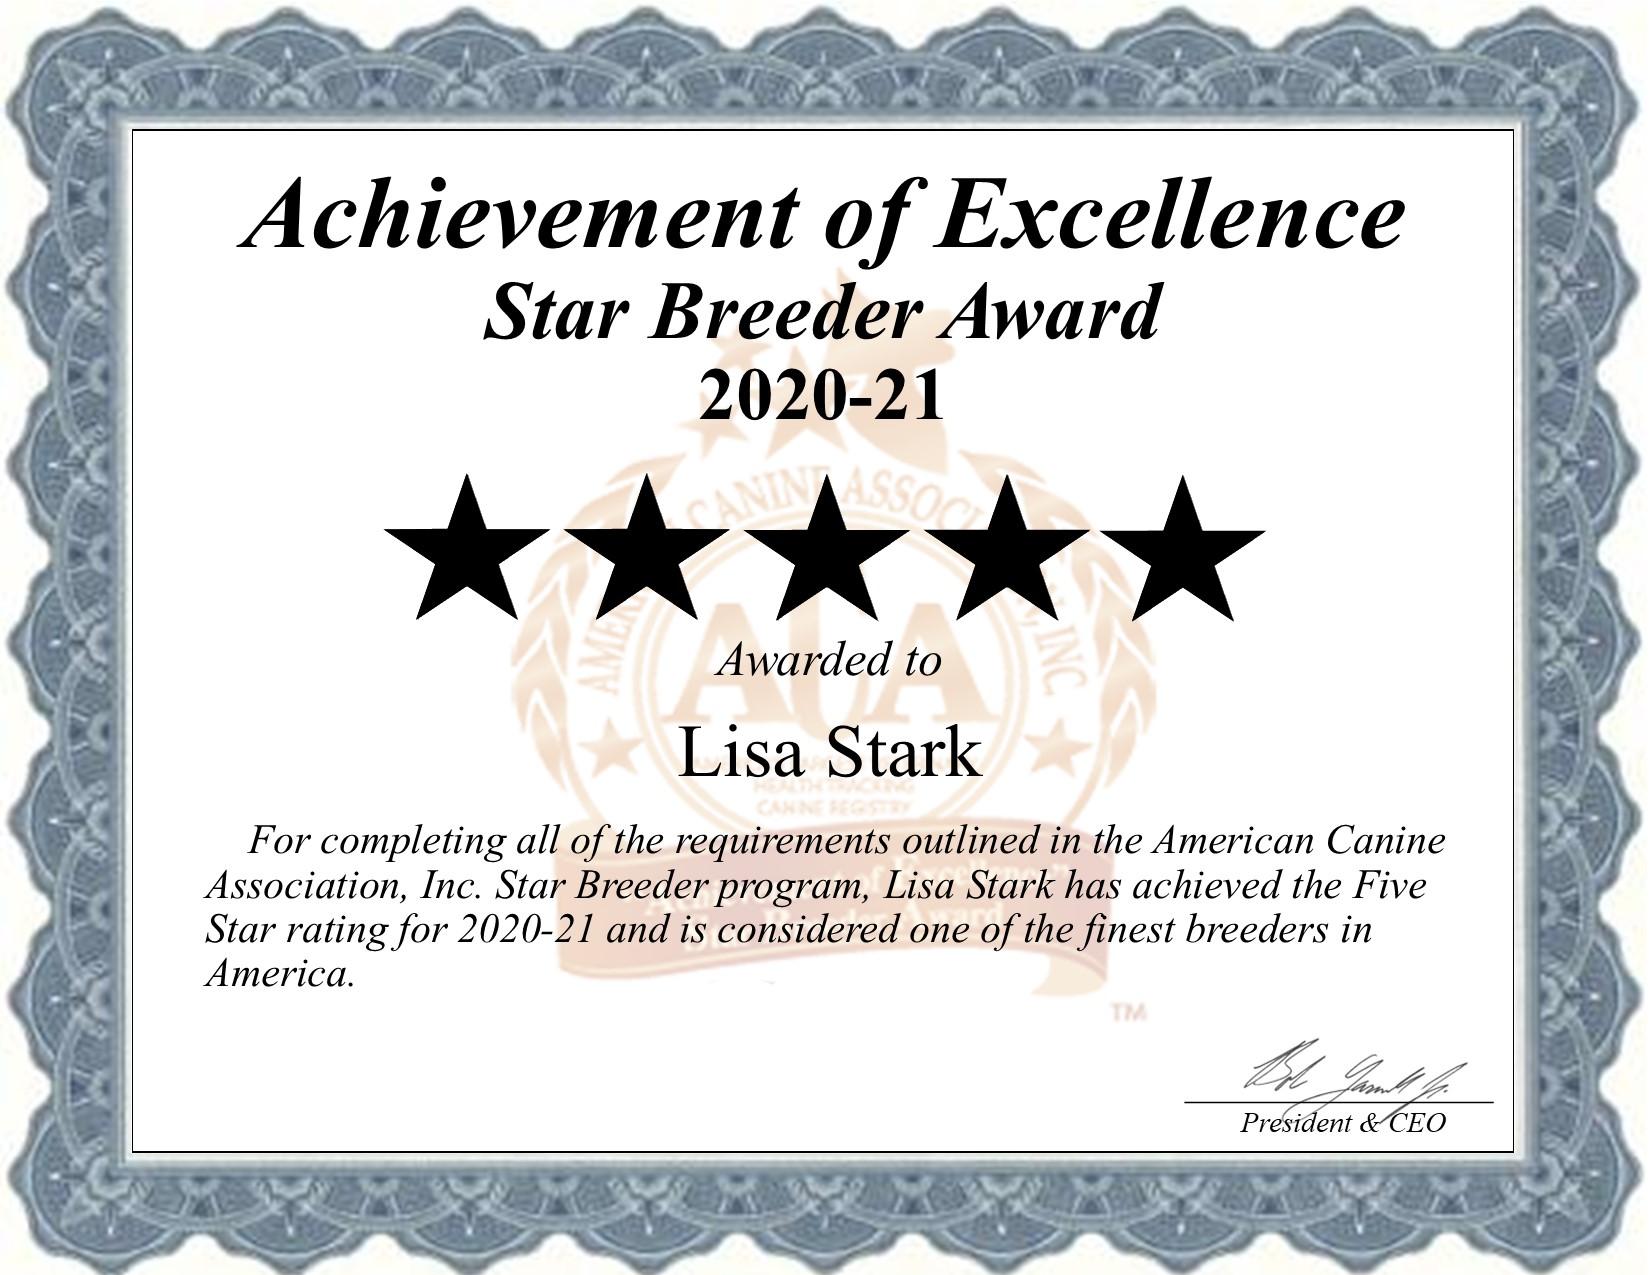 Lisa, Stark, dog, breeder, star, certificate, Lisa-Stark, Barnett, MO, Missouri, puppy, dog, kennels, mill, puppymill, usda, 5-star, aca, ica, registered, yorkie, pug, 43-B-3803